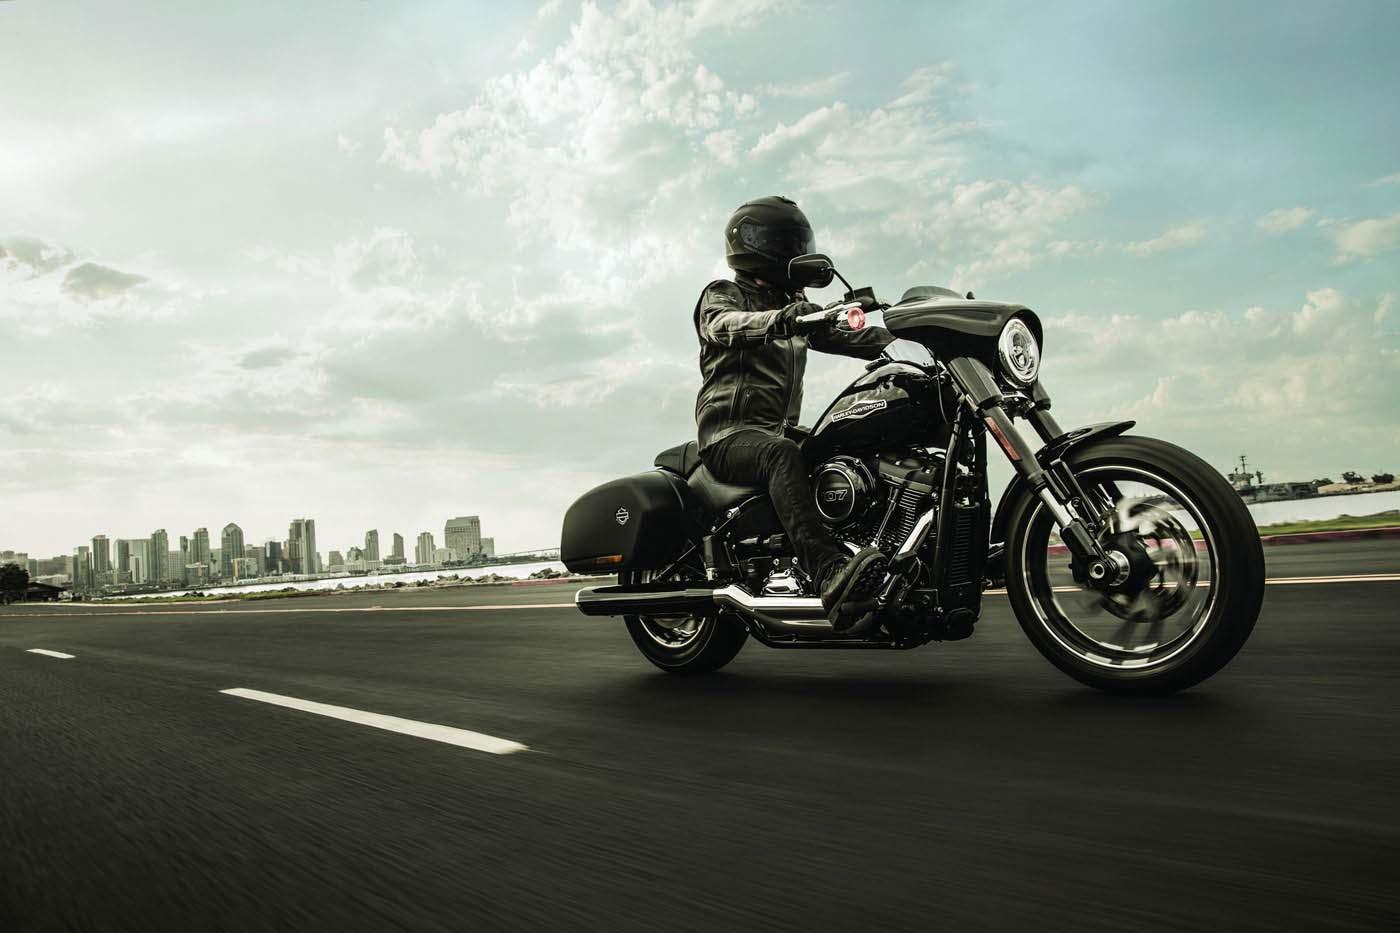 Harley-Davidson Modellneuheiten 2018